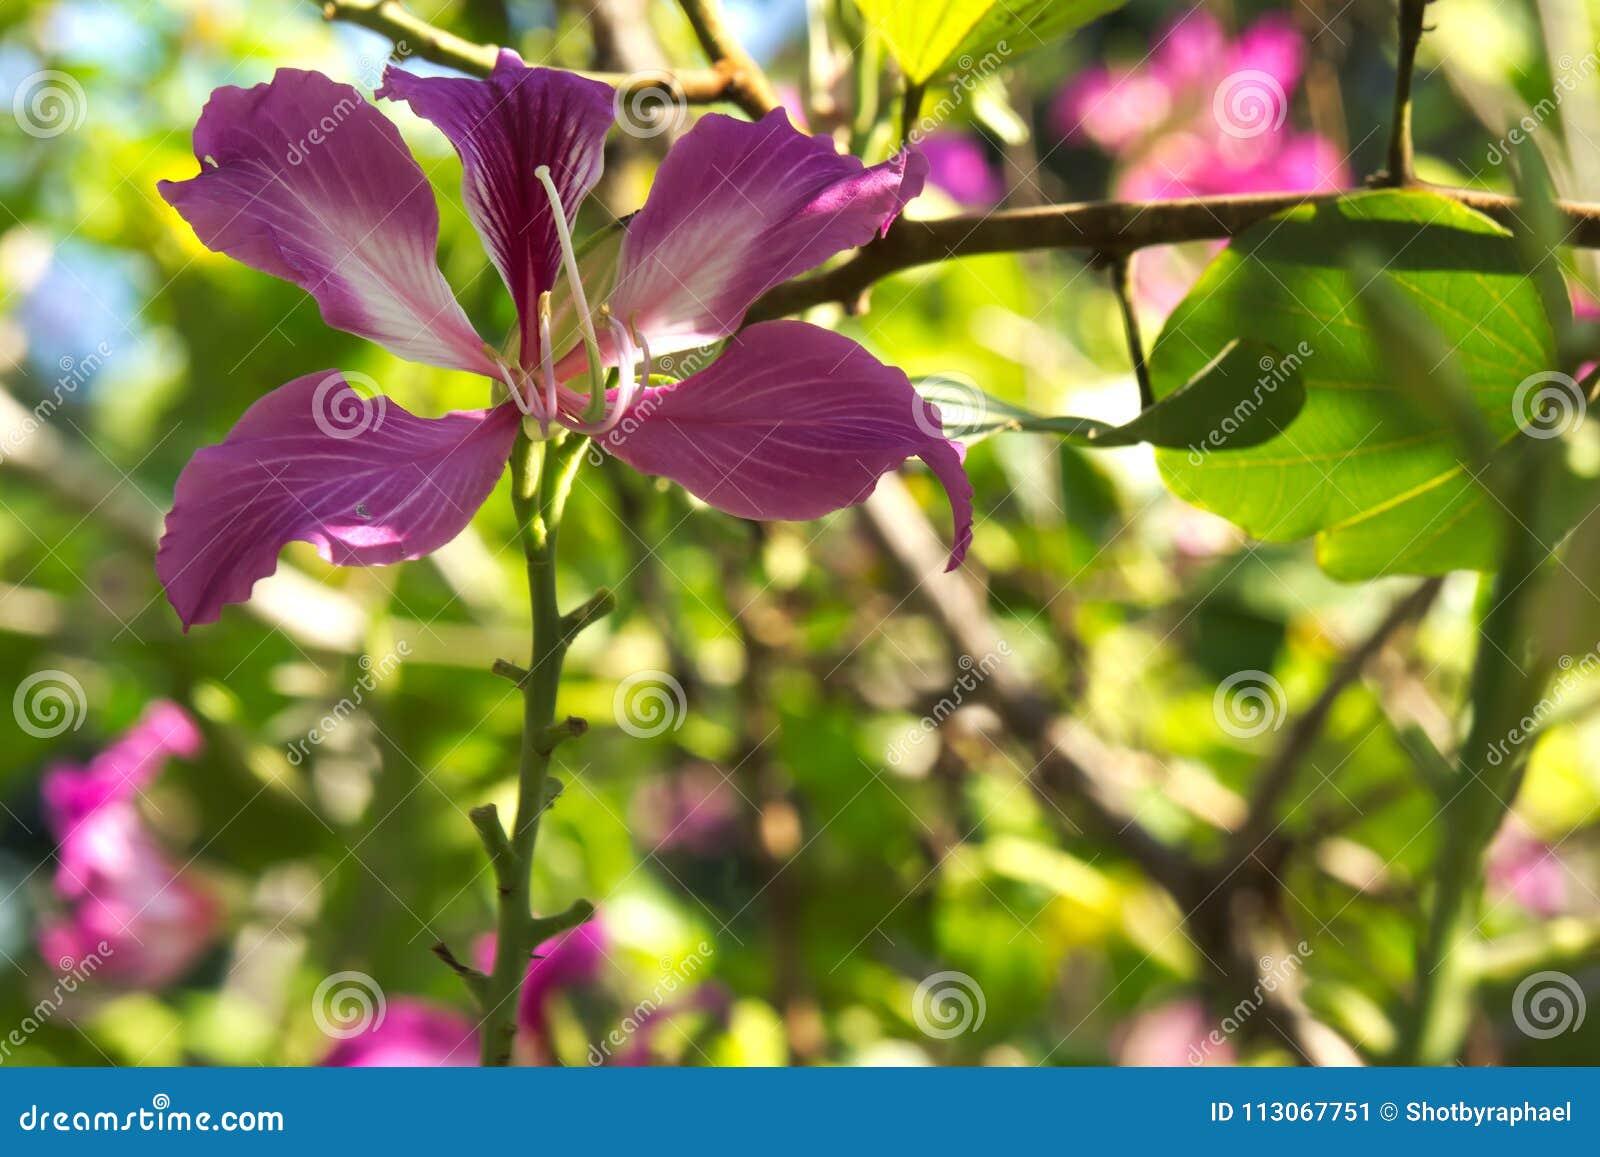 Beautiful Dark Pink Tree Flowers Blooming Under The Blue Sky In A